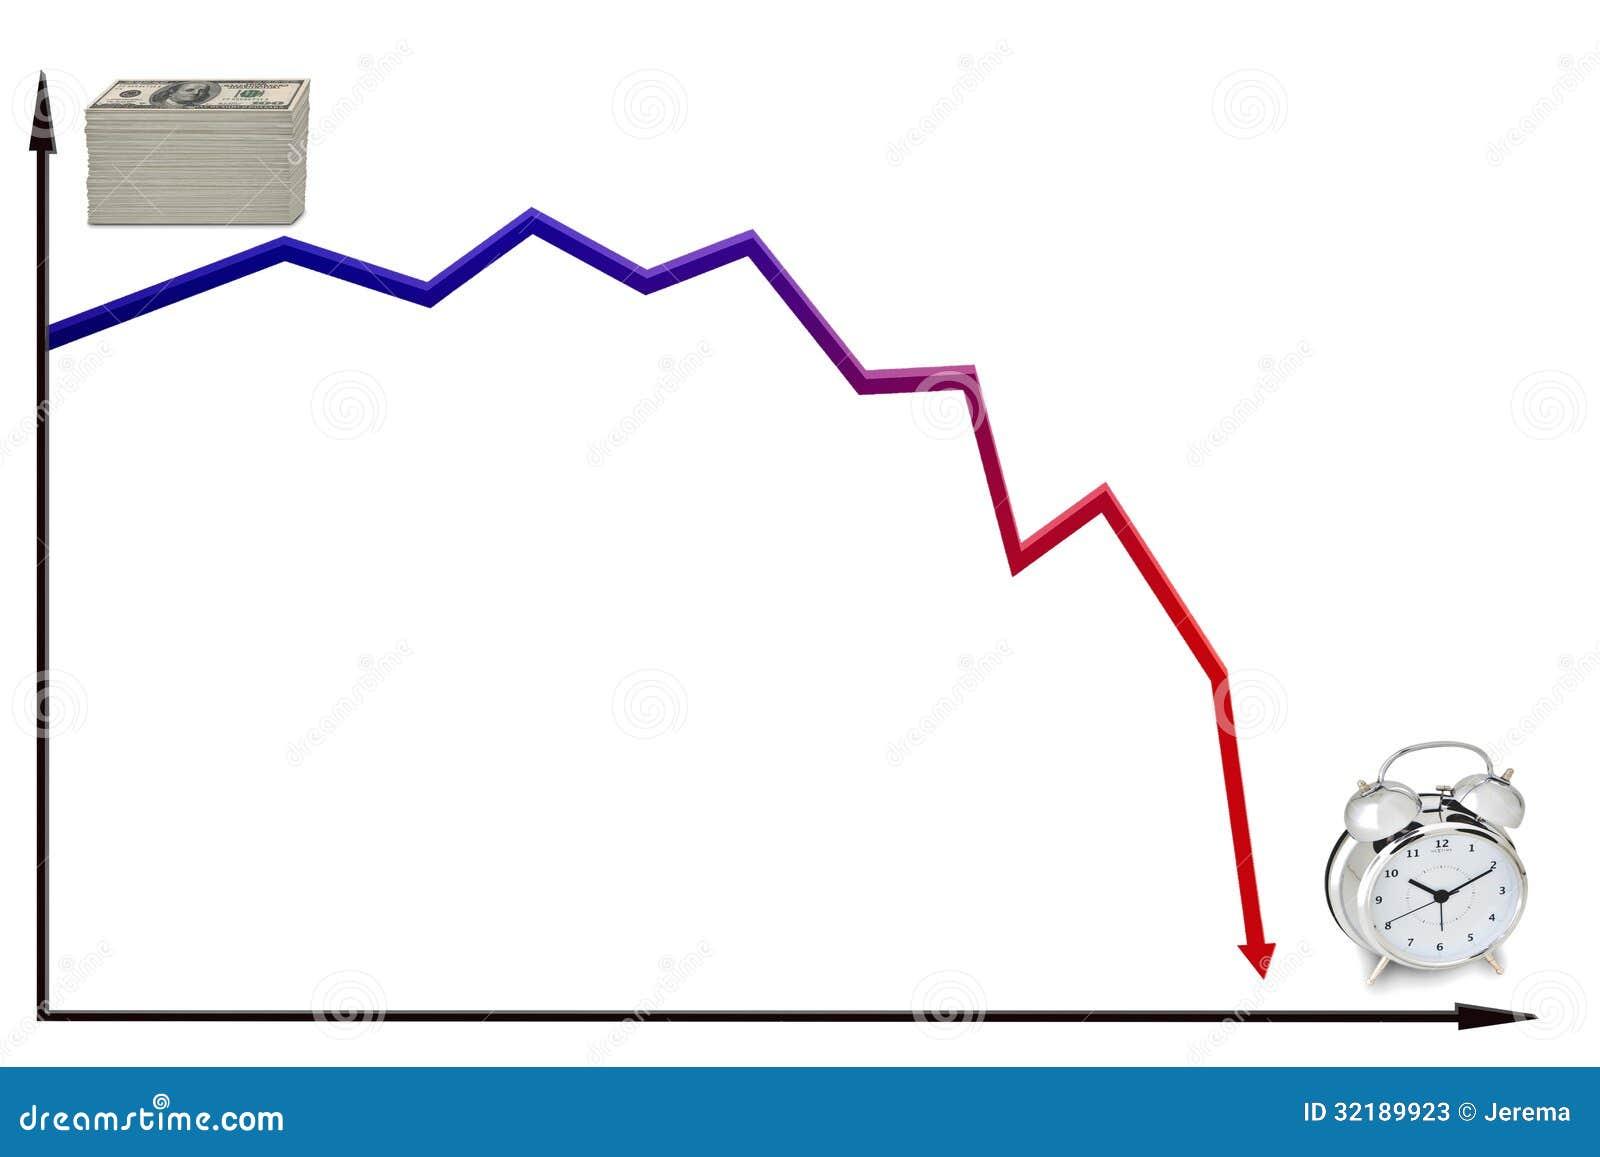 decreasing money over time stock illustration. illustration of